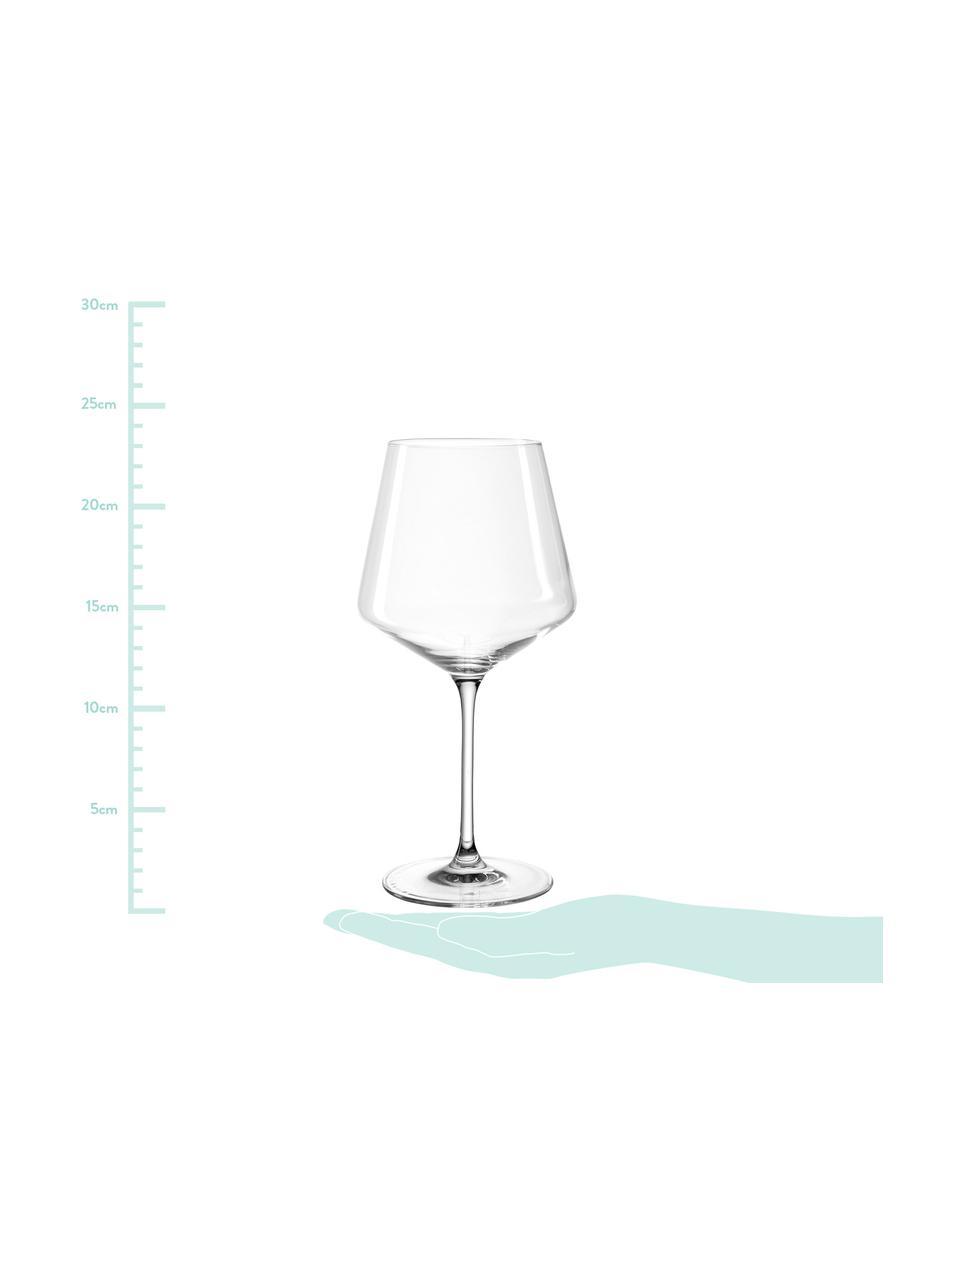 Bicchiere da vino rosso Burgunder Puccini 6 pz, vetro Teqton®, Trasparente, Ø 11 x Alt. 23 cm